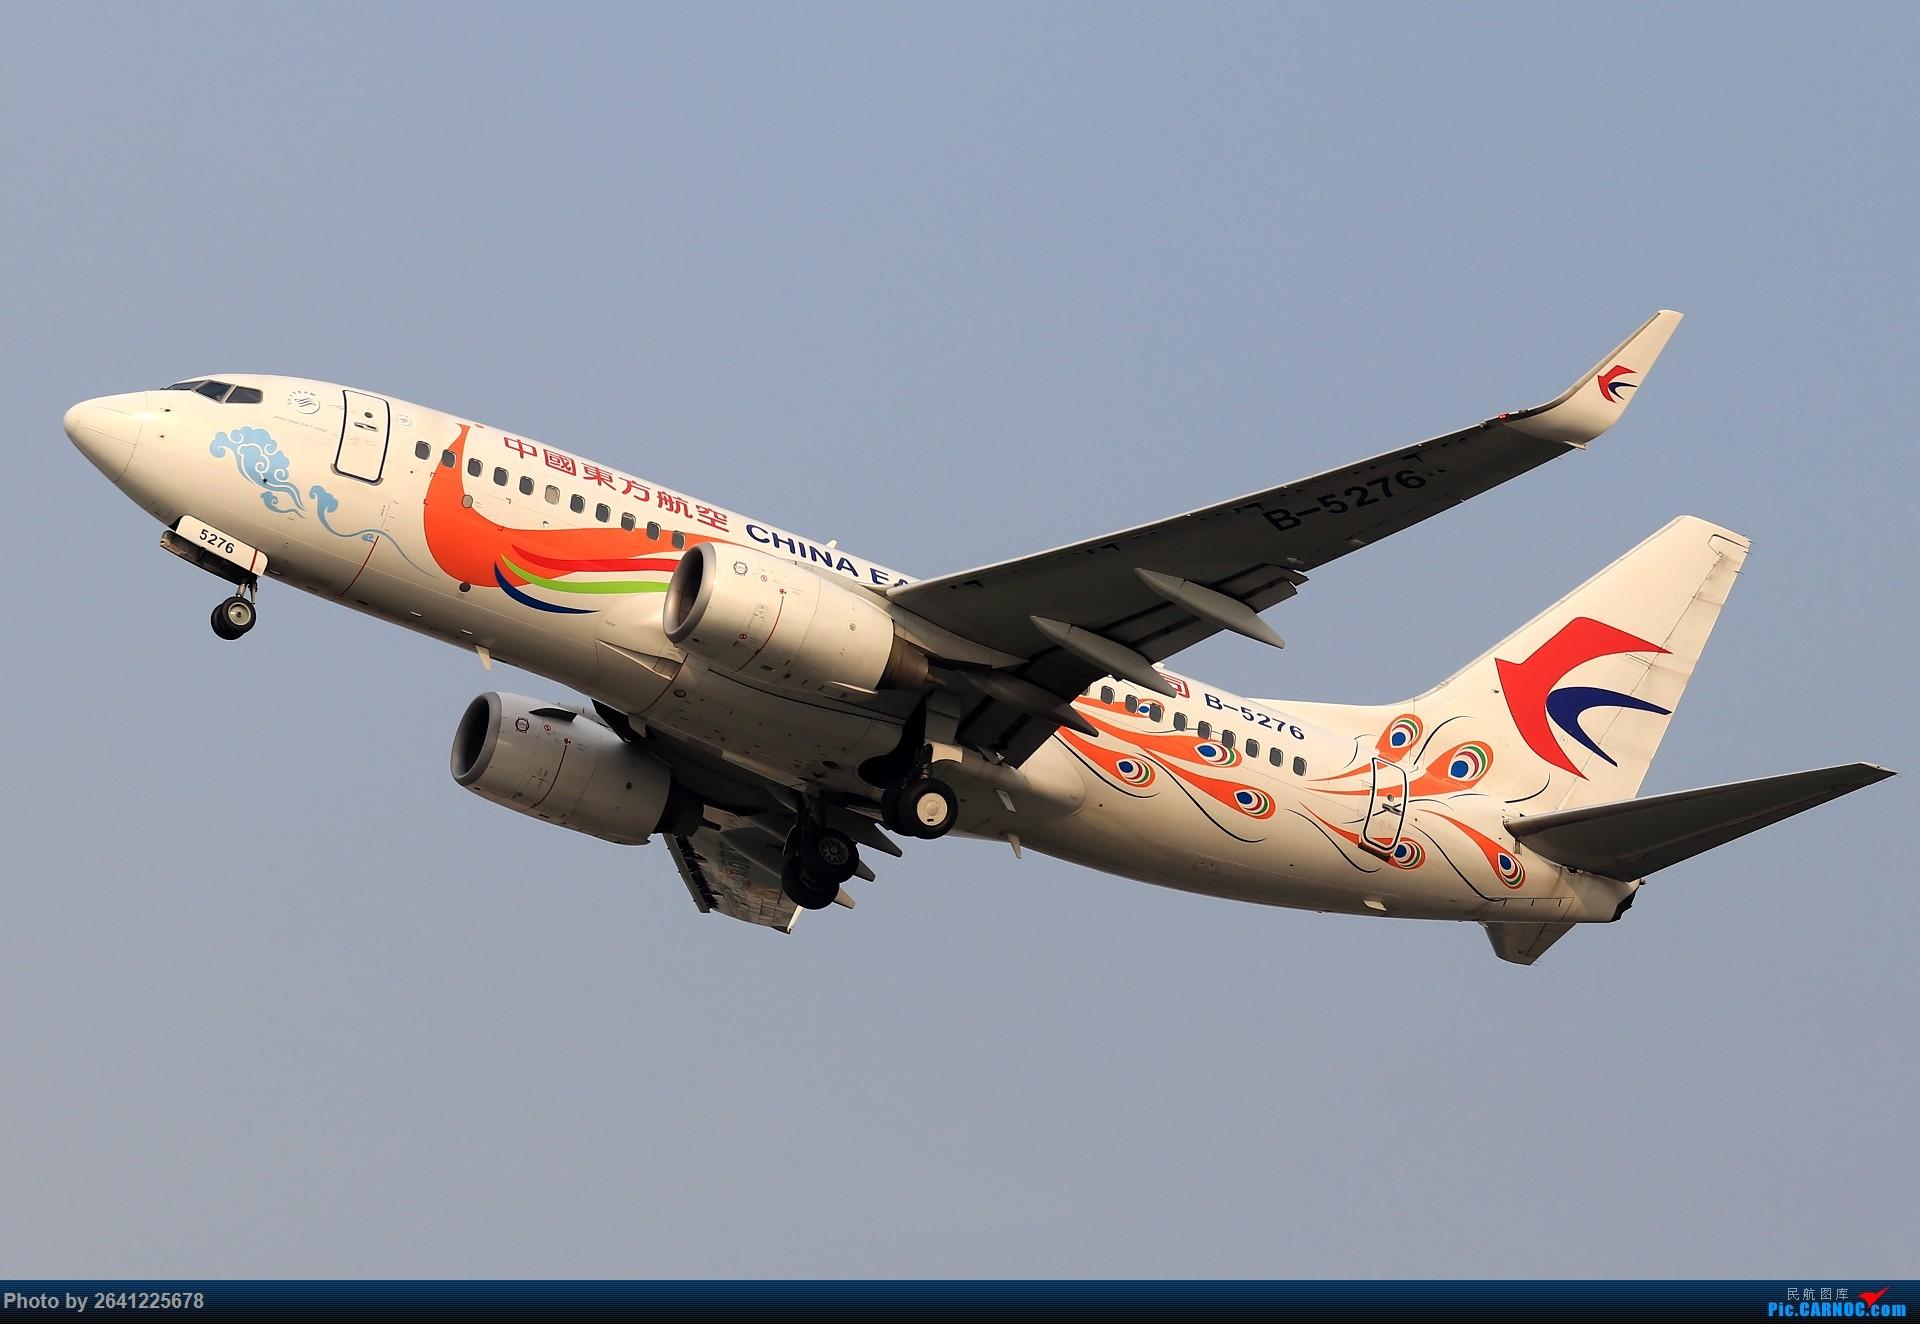 Re:[原创]【TAMRON 156 G2+77D 持续更新中】*****试新机+新镜*****(烂天+地热+渣技术,望大佬多多包涵) BOEING 737-700 B-5276 中国北京首都国际机场